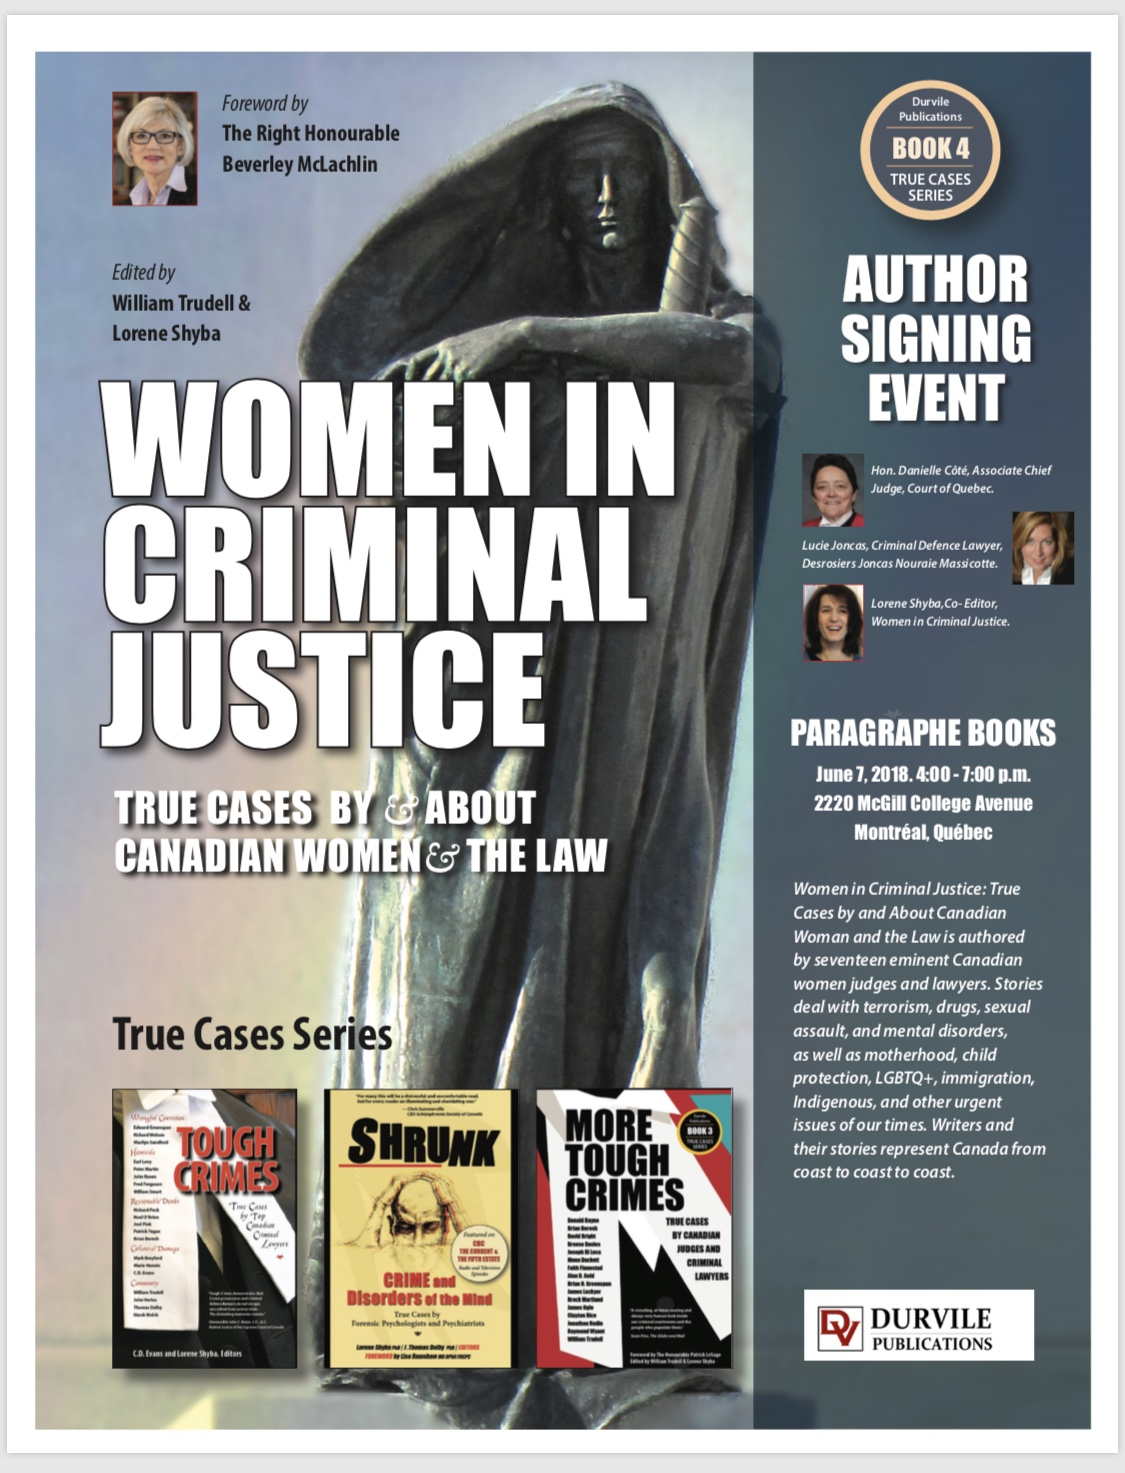 Lancement du livre Women in Criminal Justice  7 juin 2018 Montreal